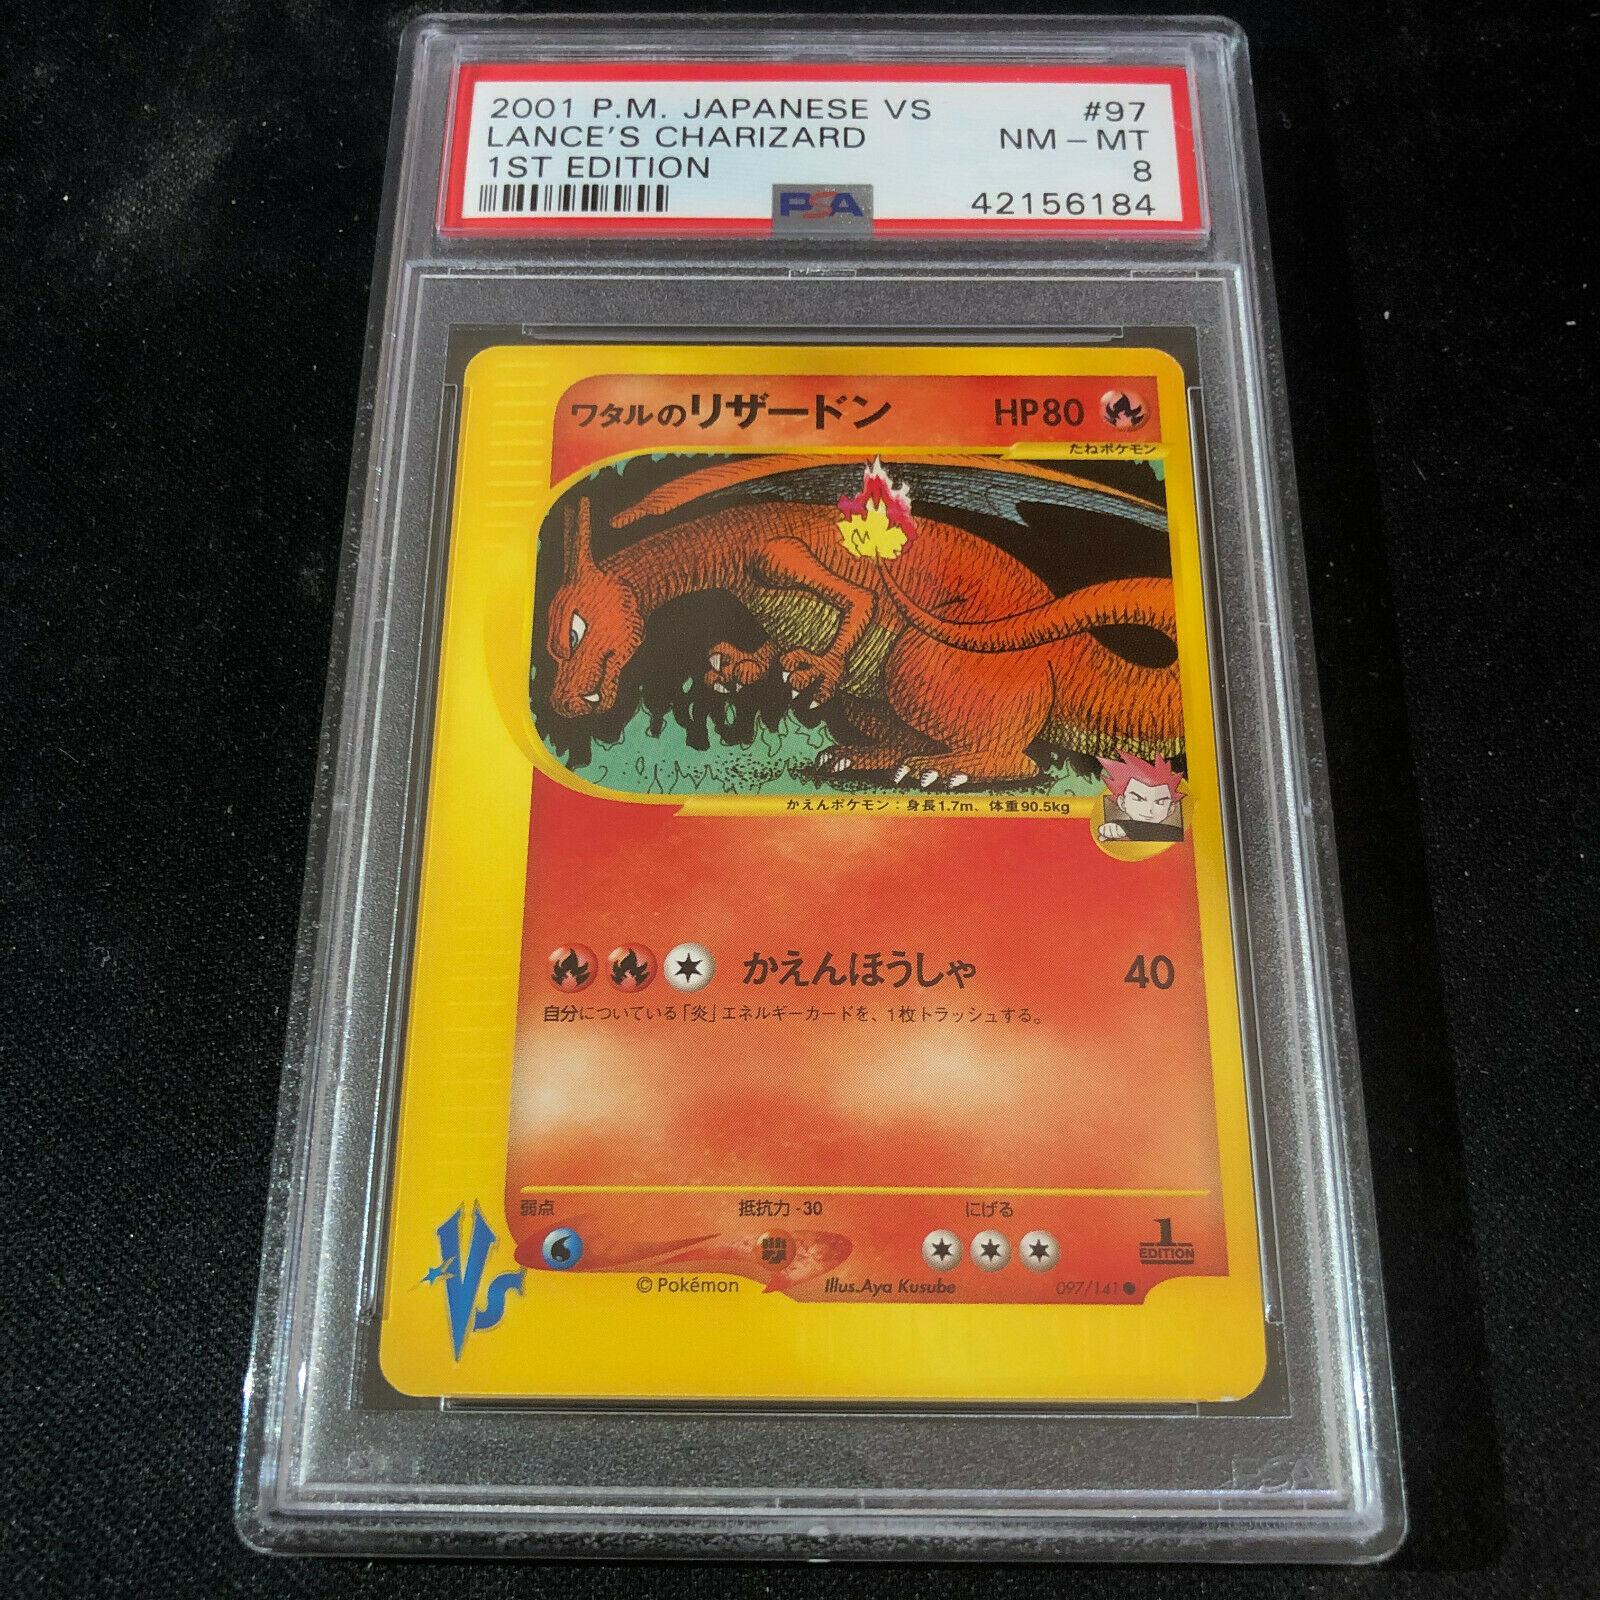 PSA 8  Japanese 1st ED Lances Charizard VS Series 2001 097141 Pokemon Card